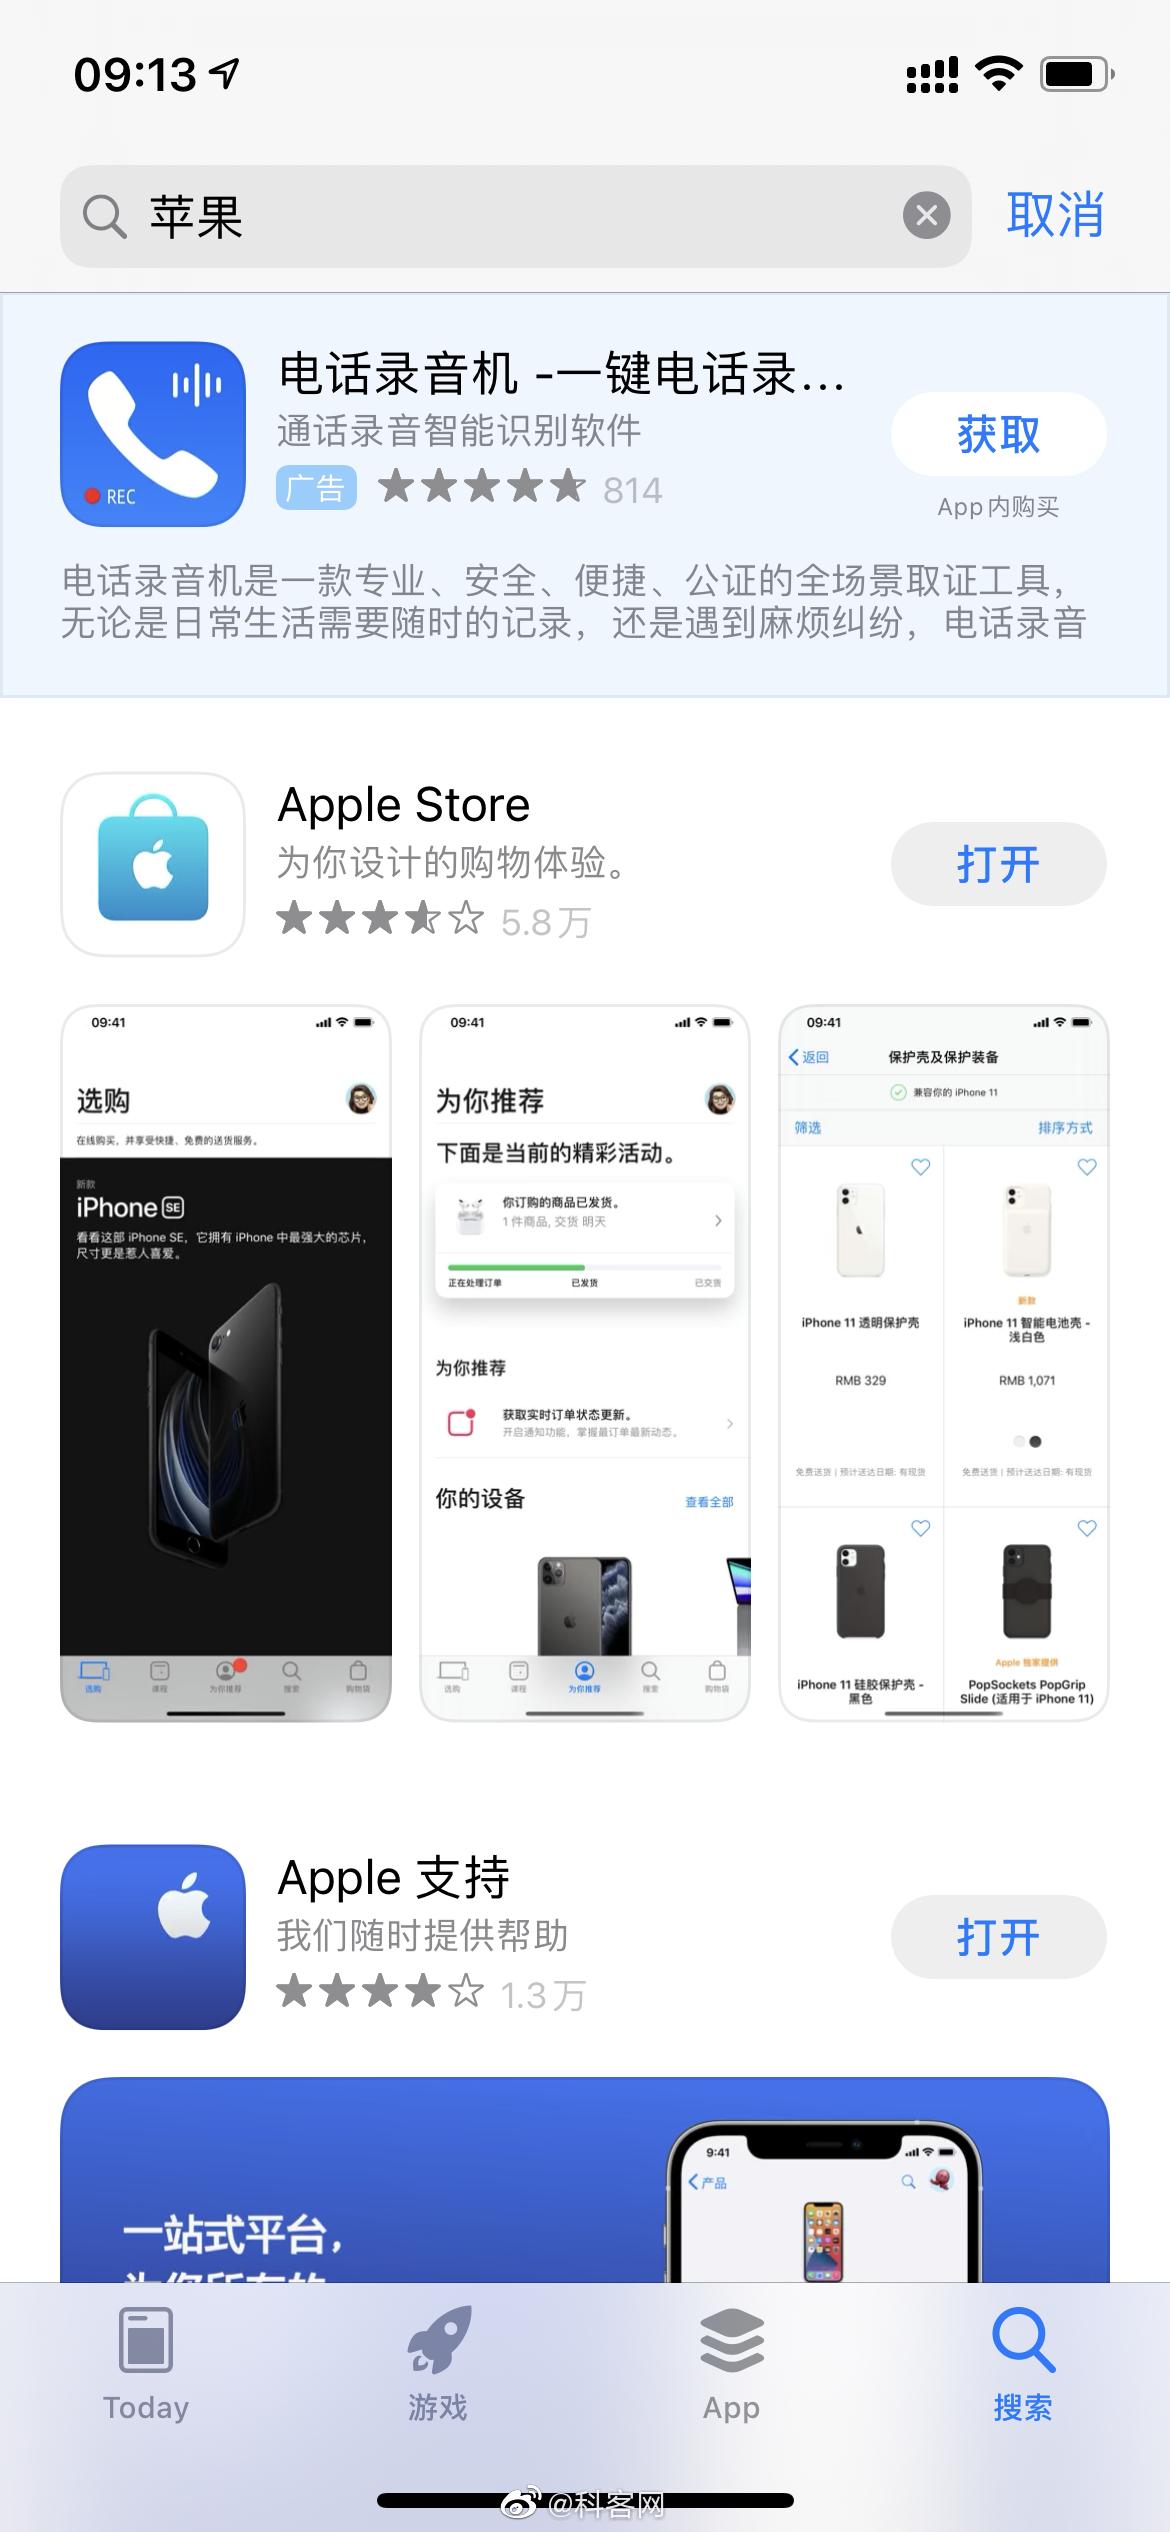 "App Store如今也是放飞了,连搜索""苹果""都有置顶广告……"